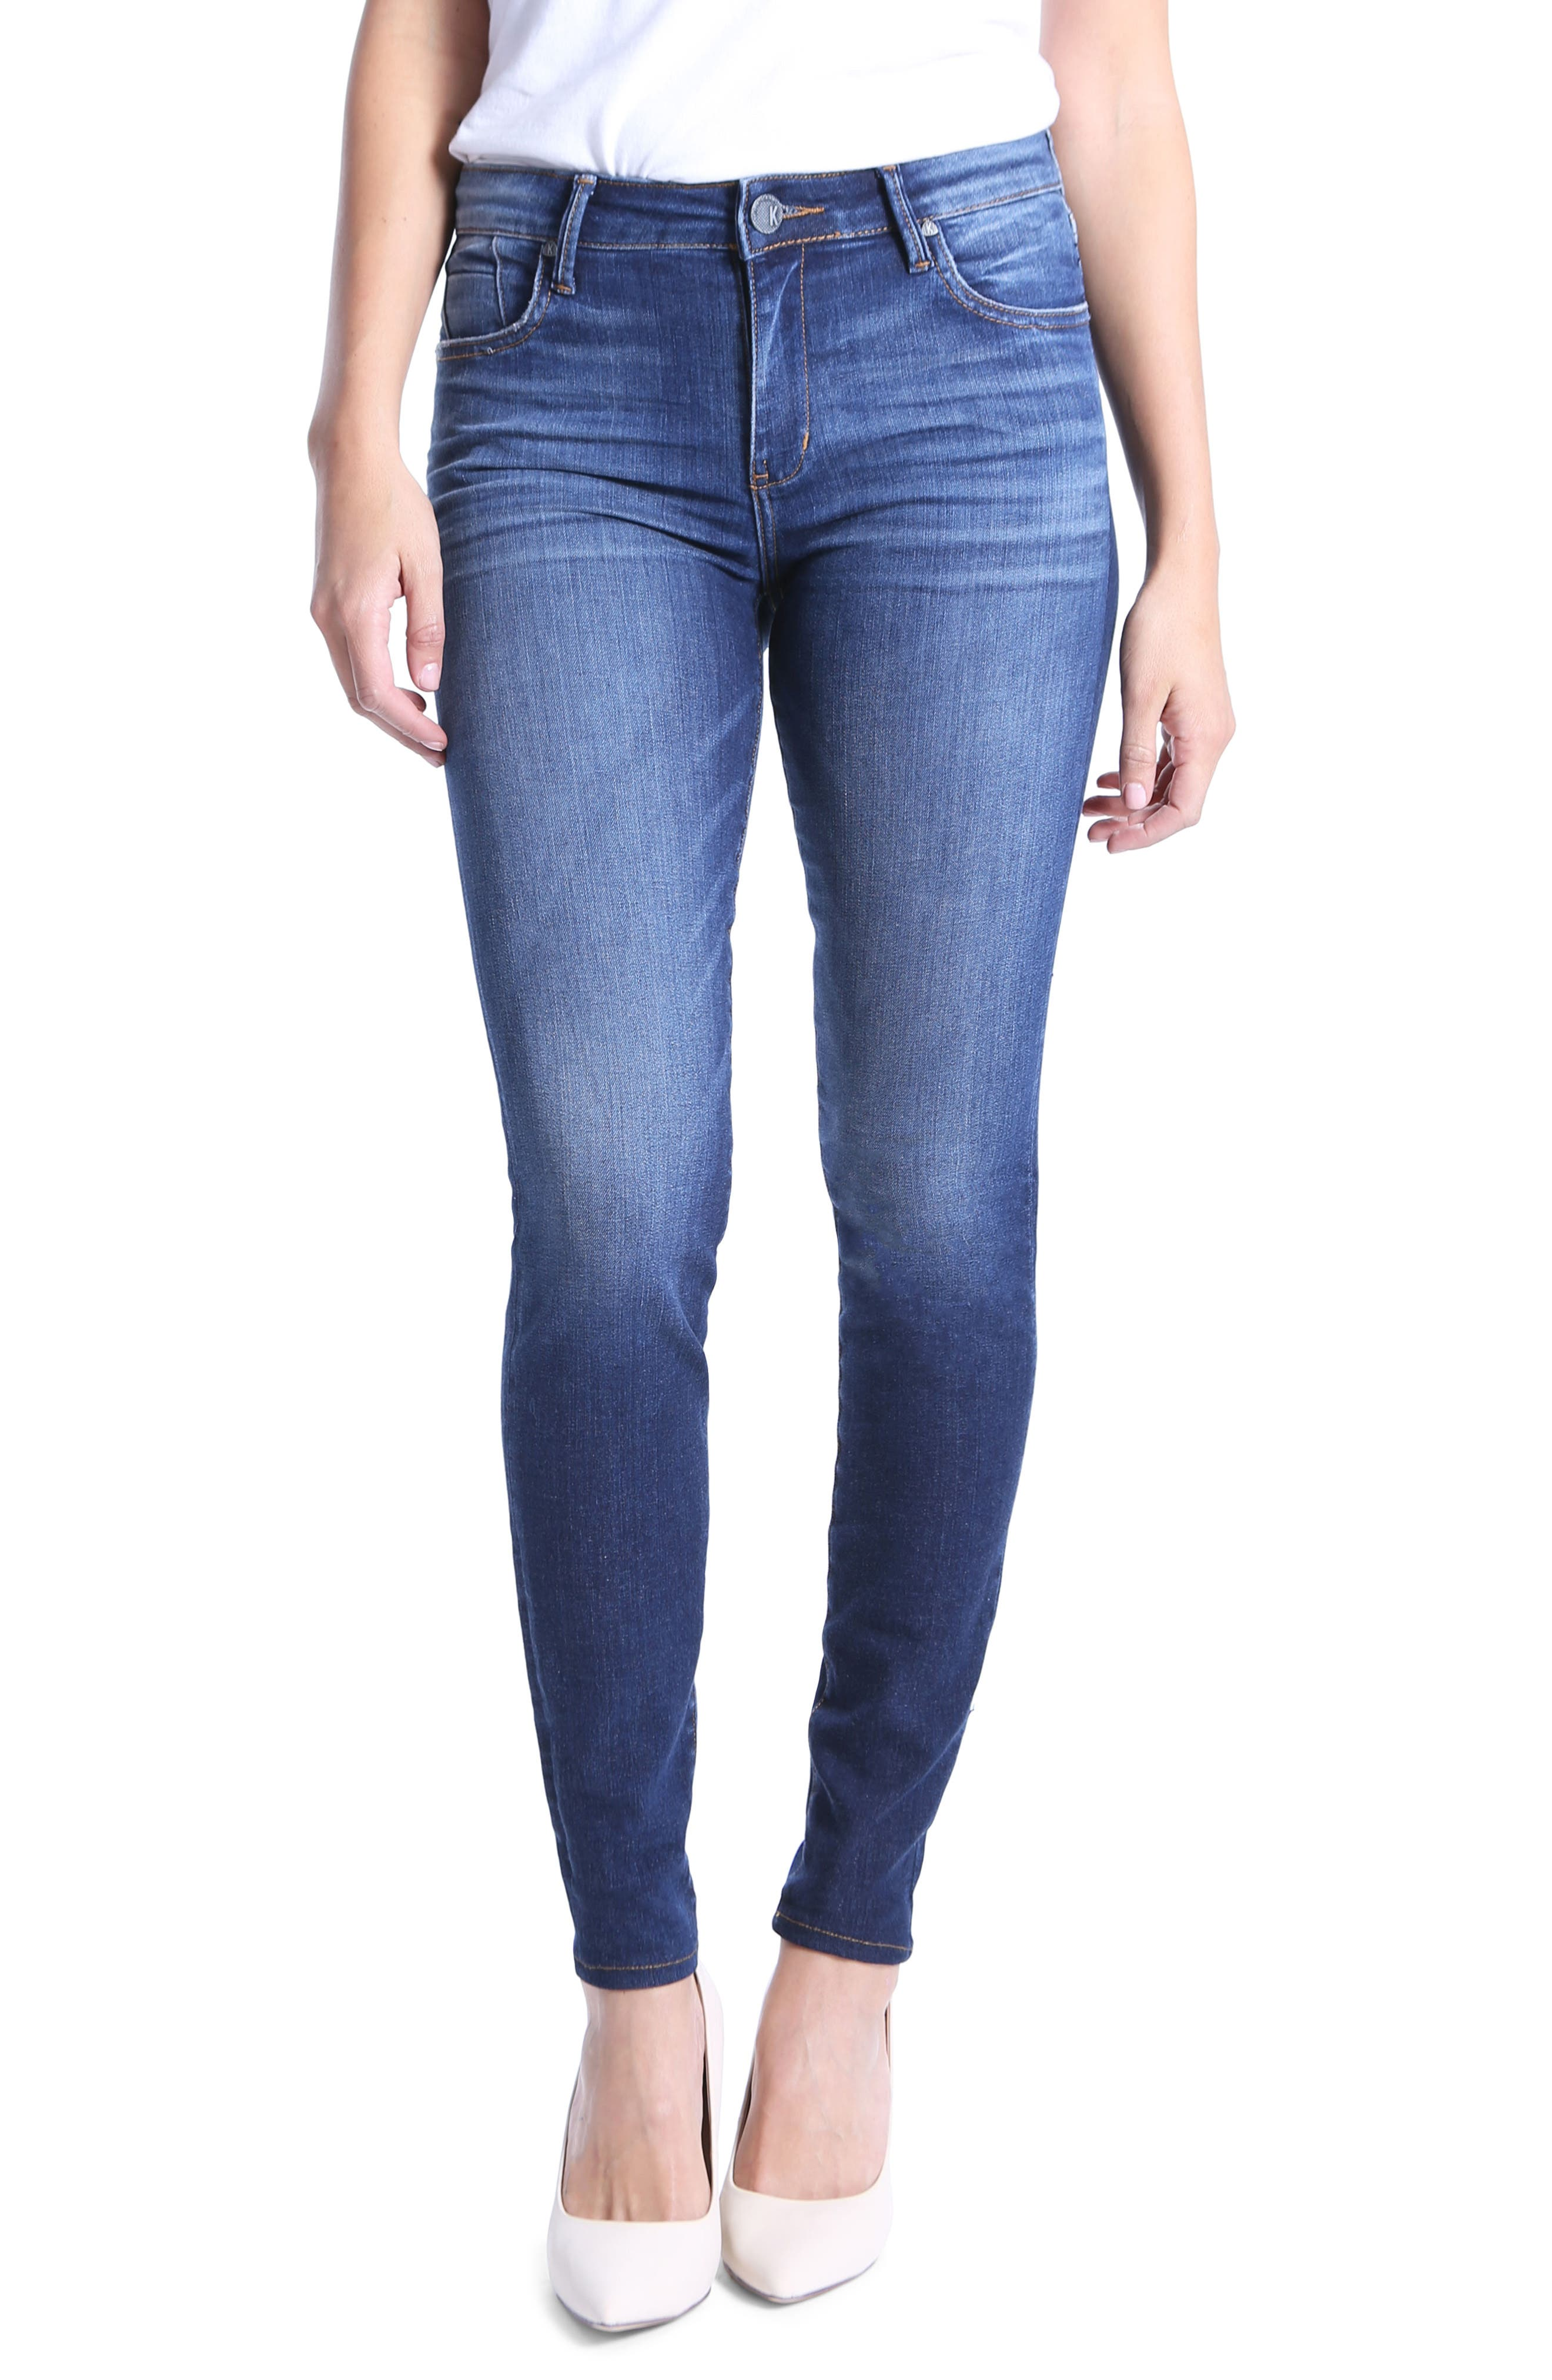 Women's Kut From The Kloth Mia High Waist Skinny Jeans